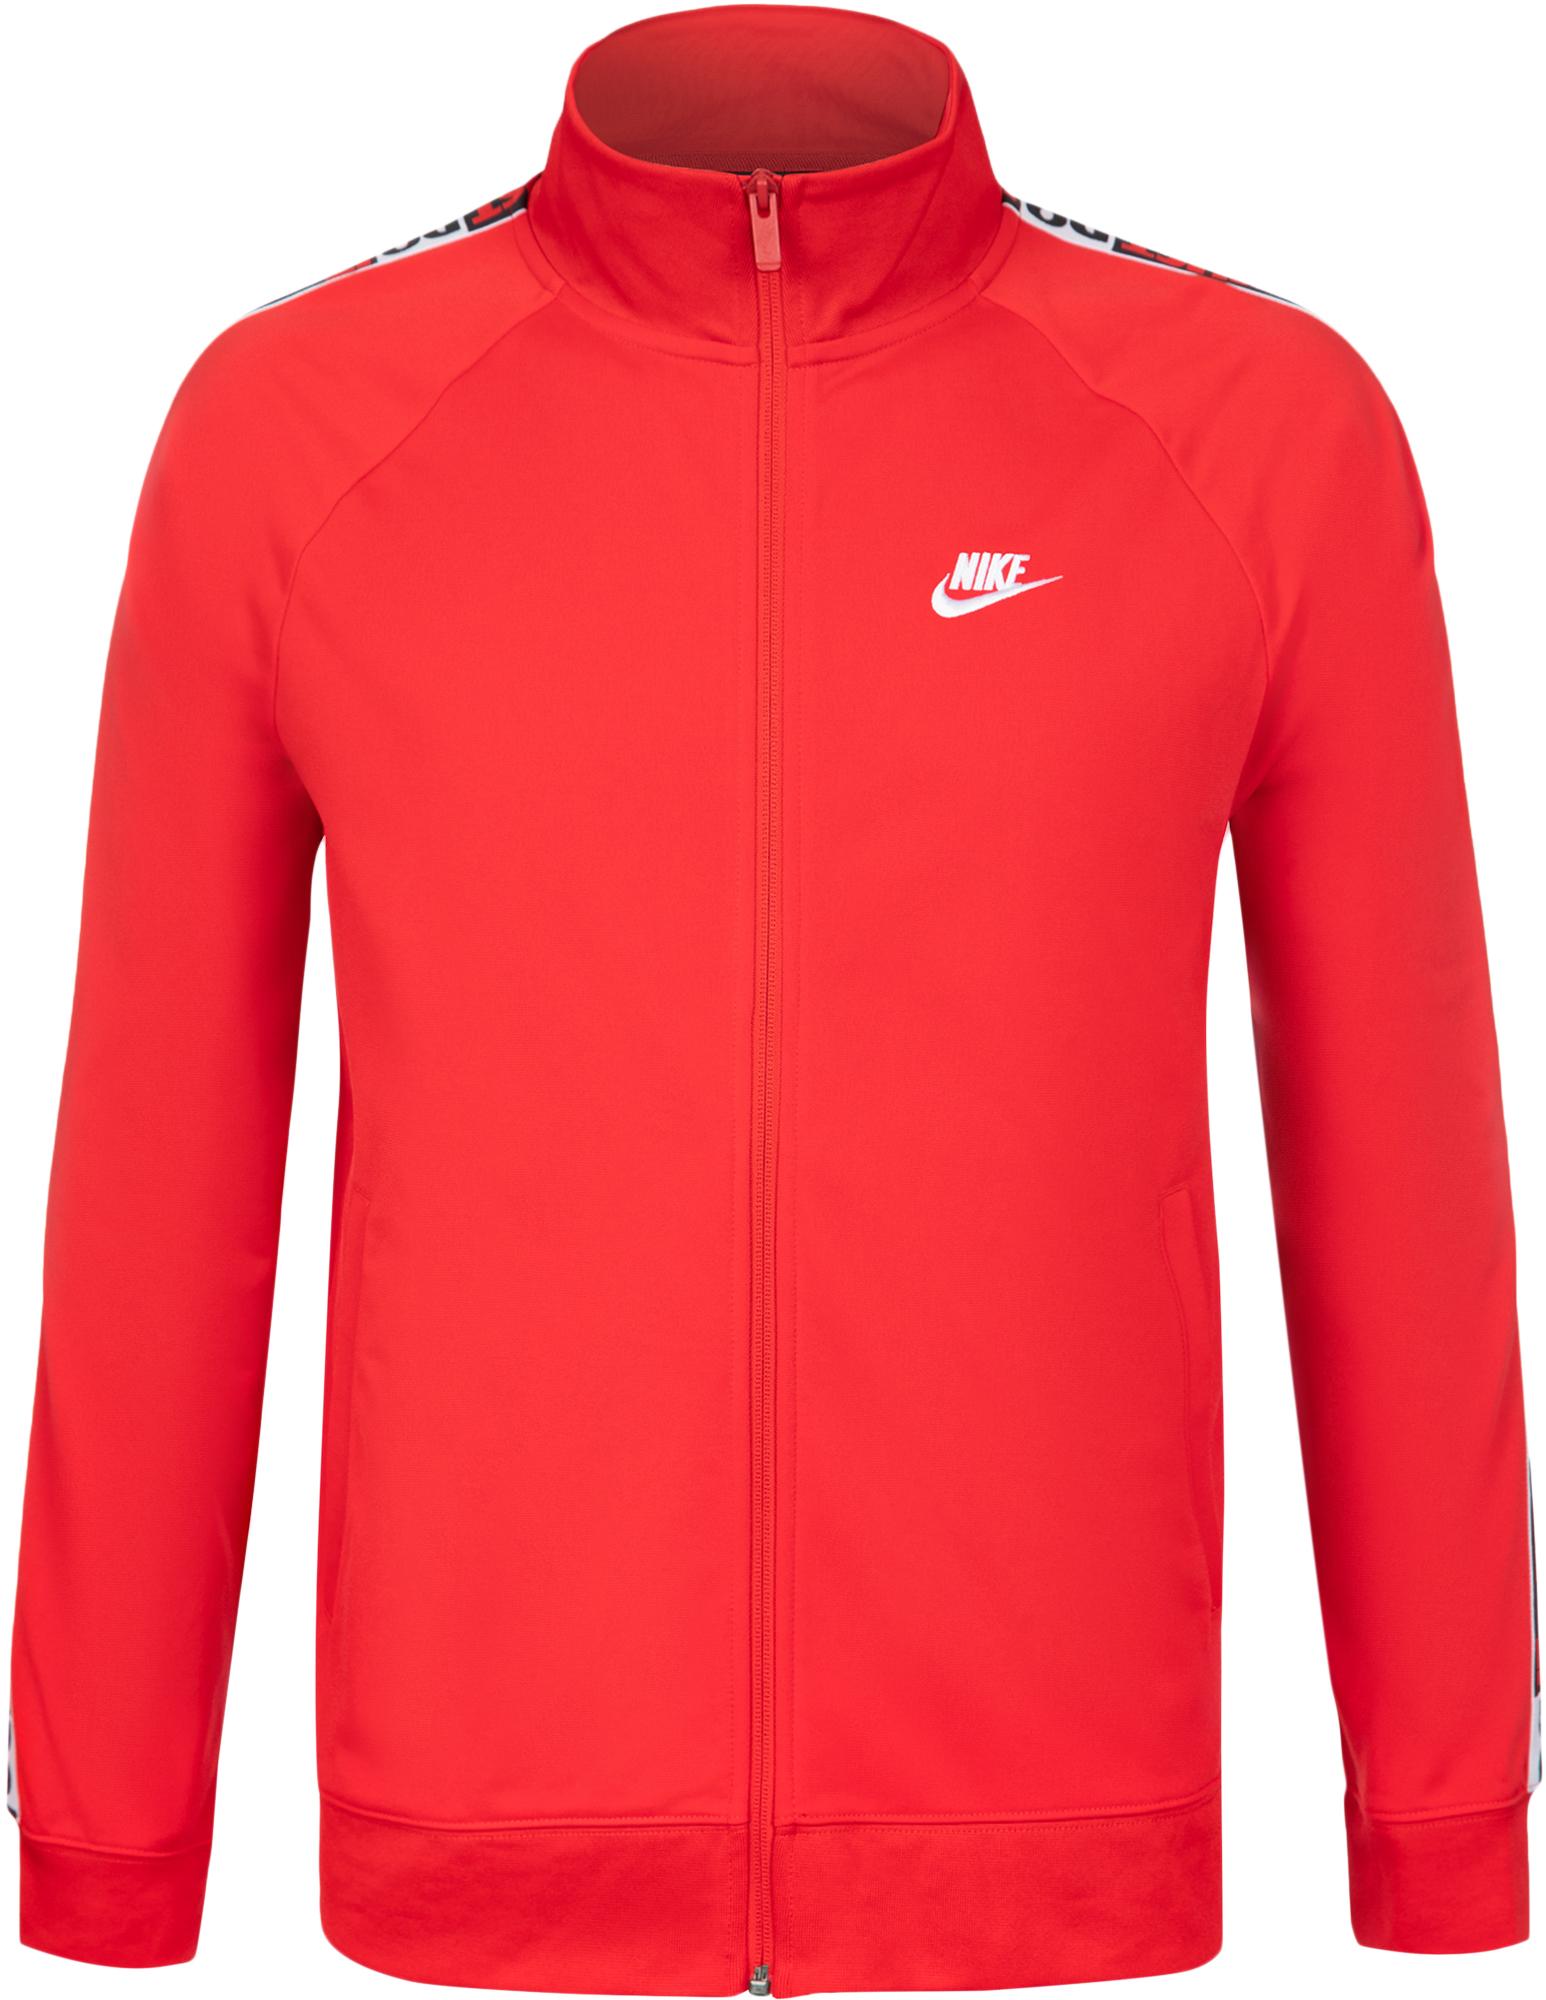 Nike Олимпийка мужская Nike Sportswear JDI, размер 50-52